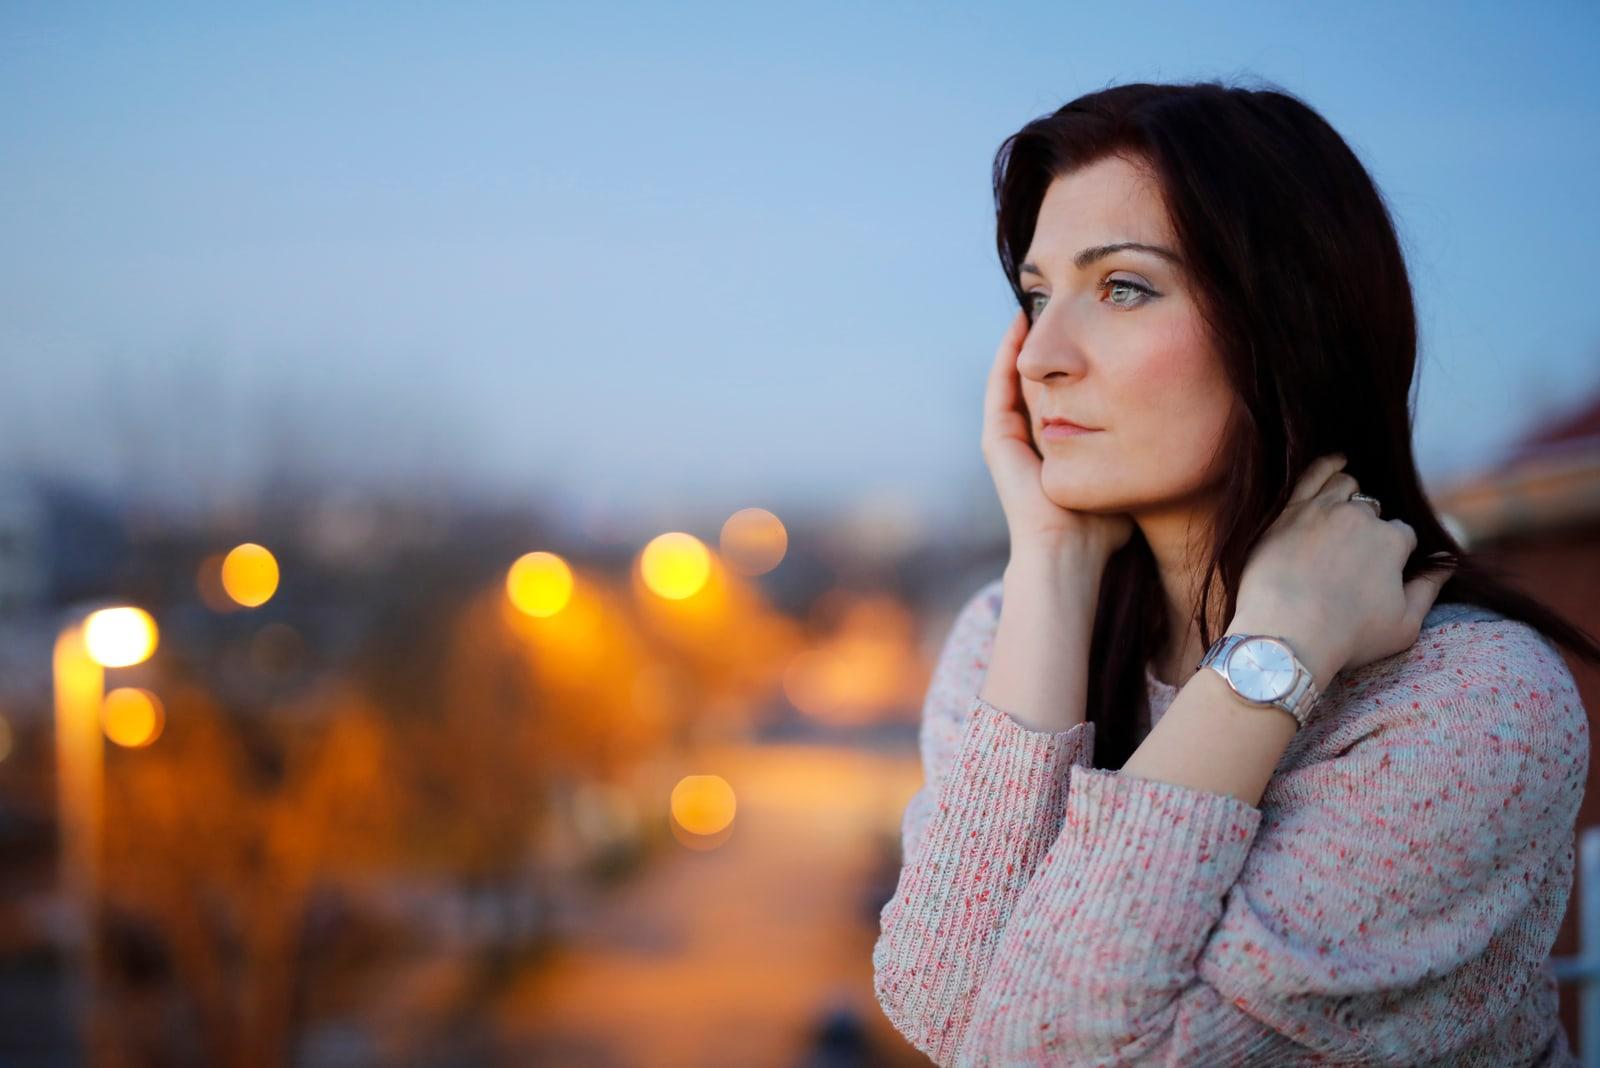 pensive woman on the balcony